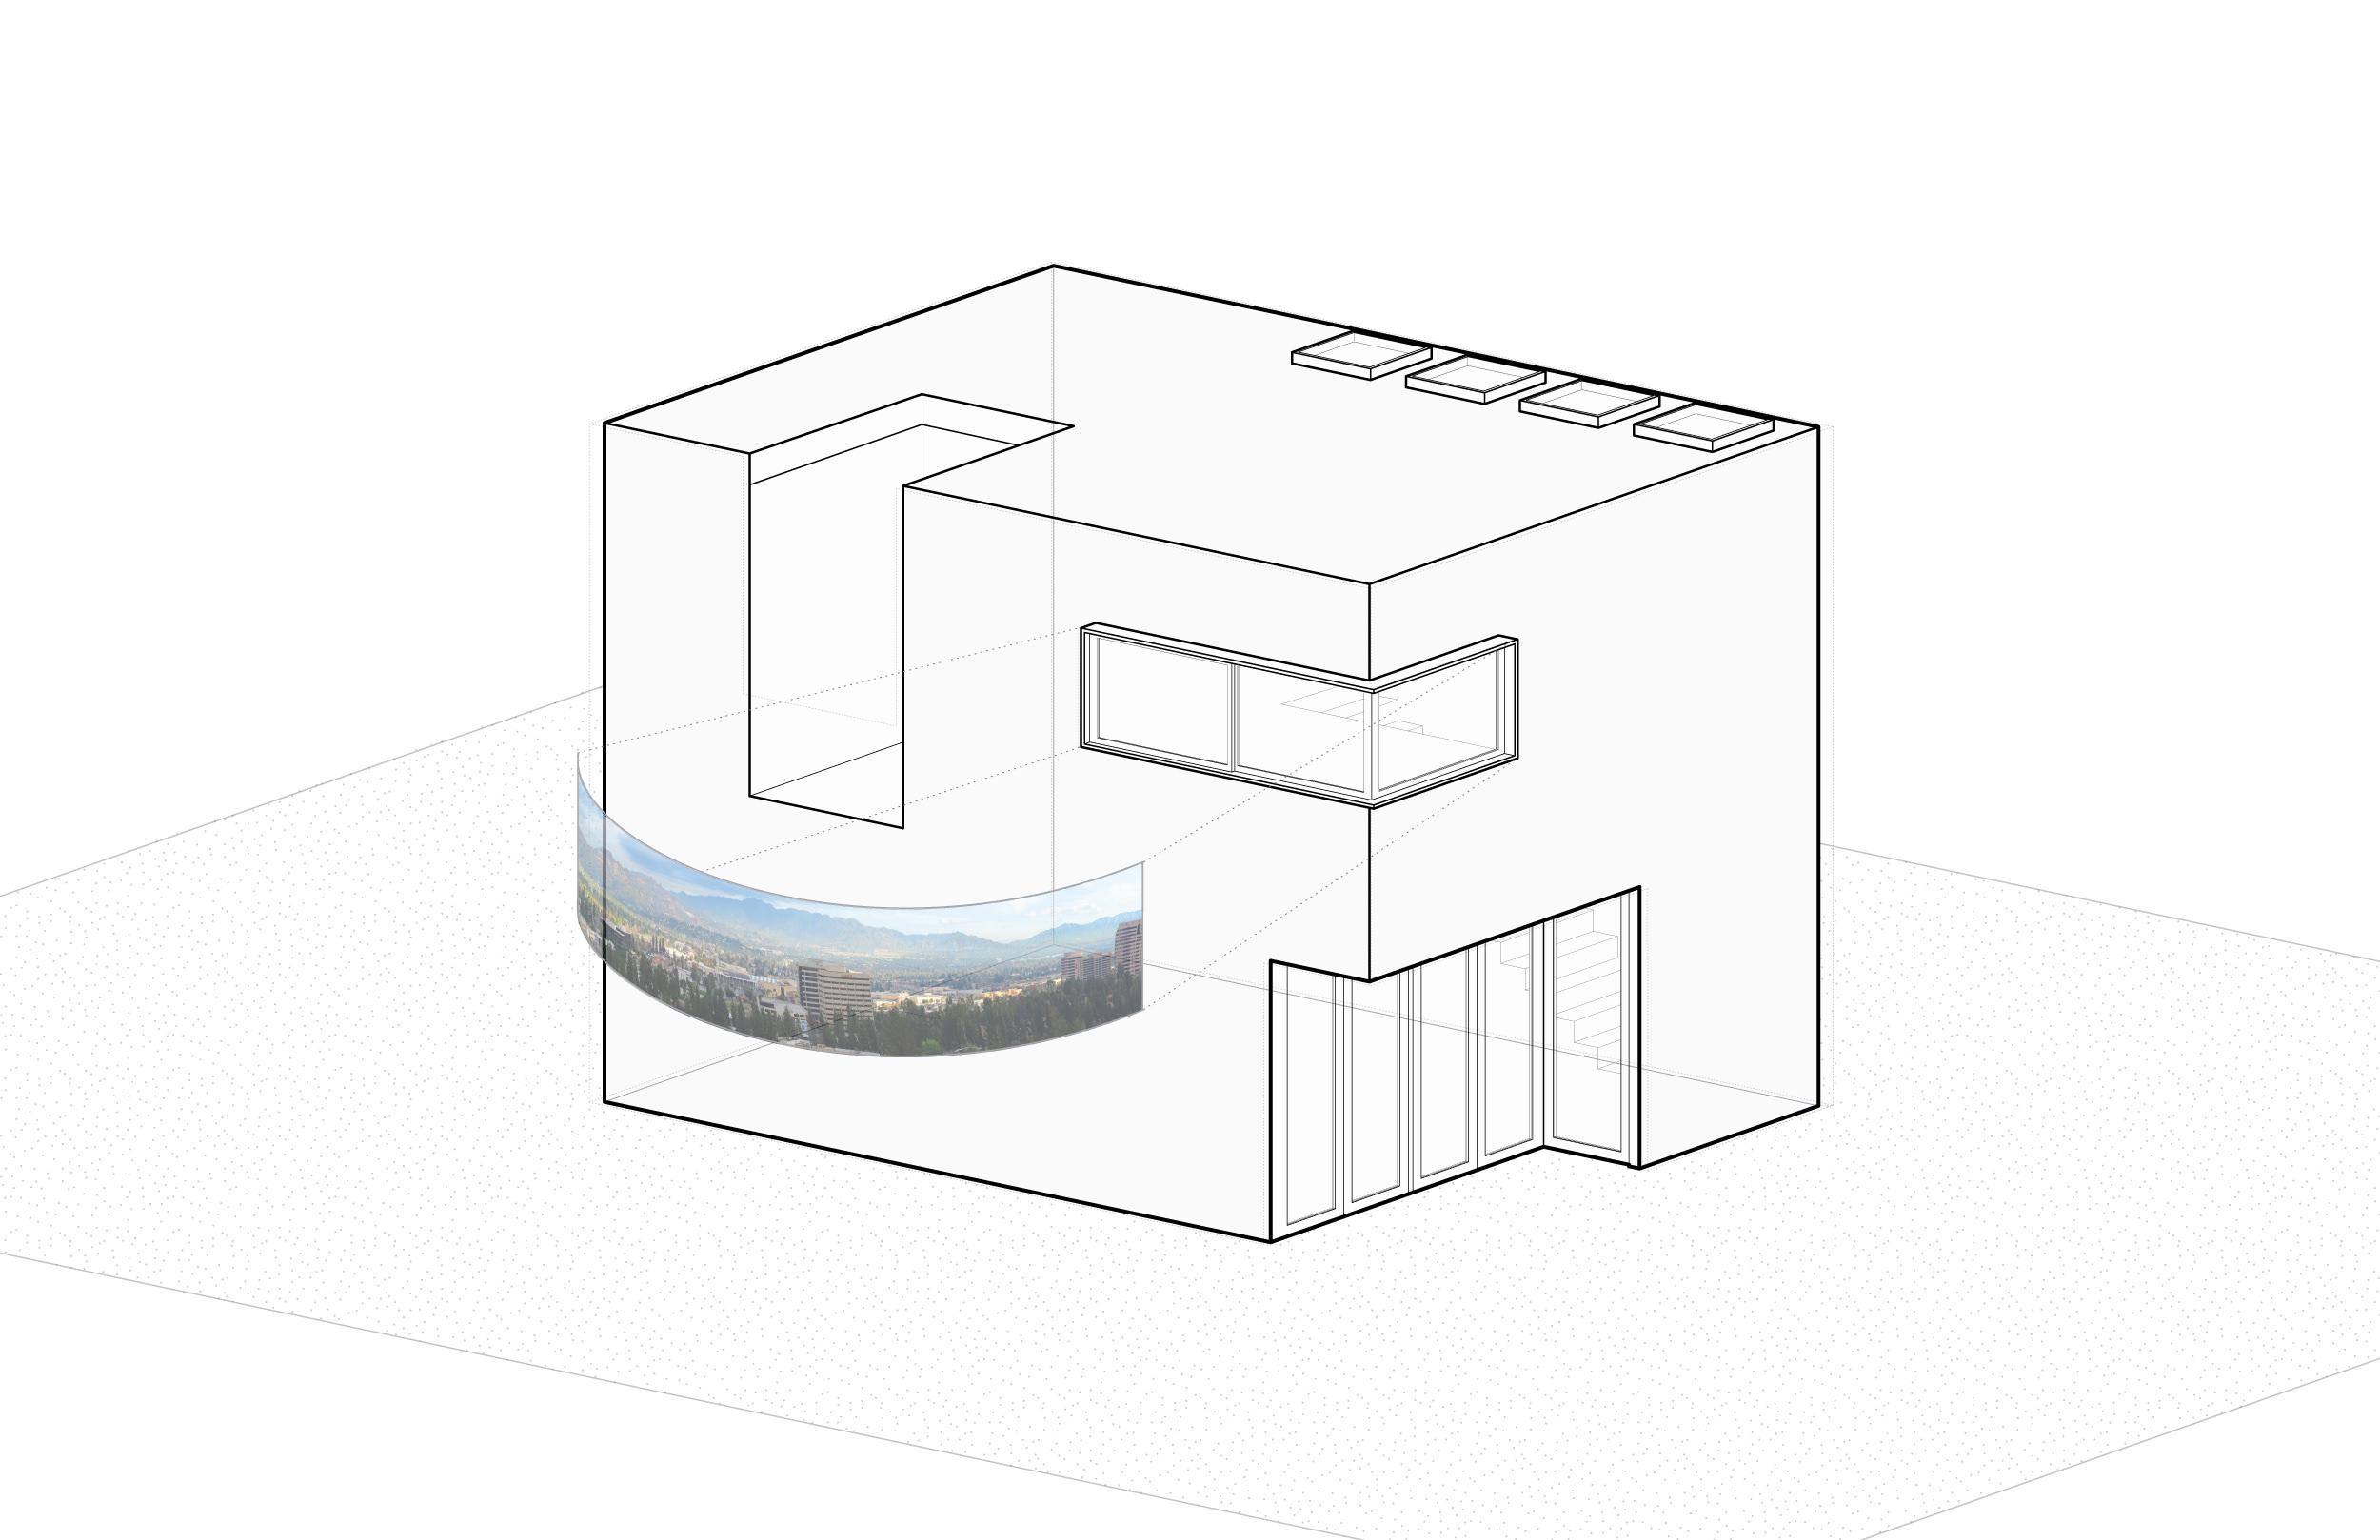 Studio-City-House_Diagram_05.jpg